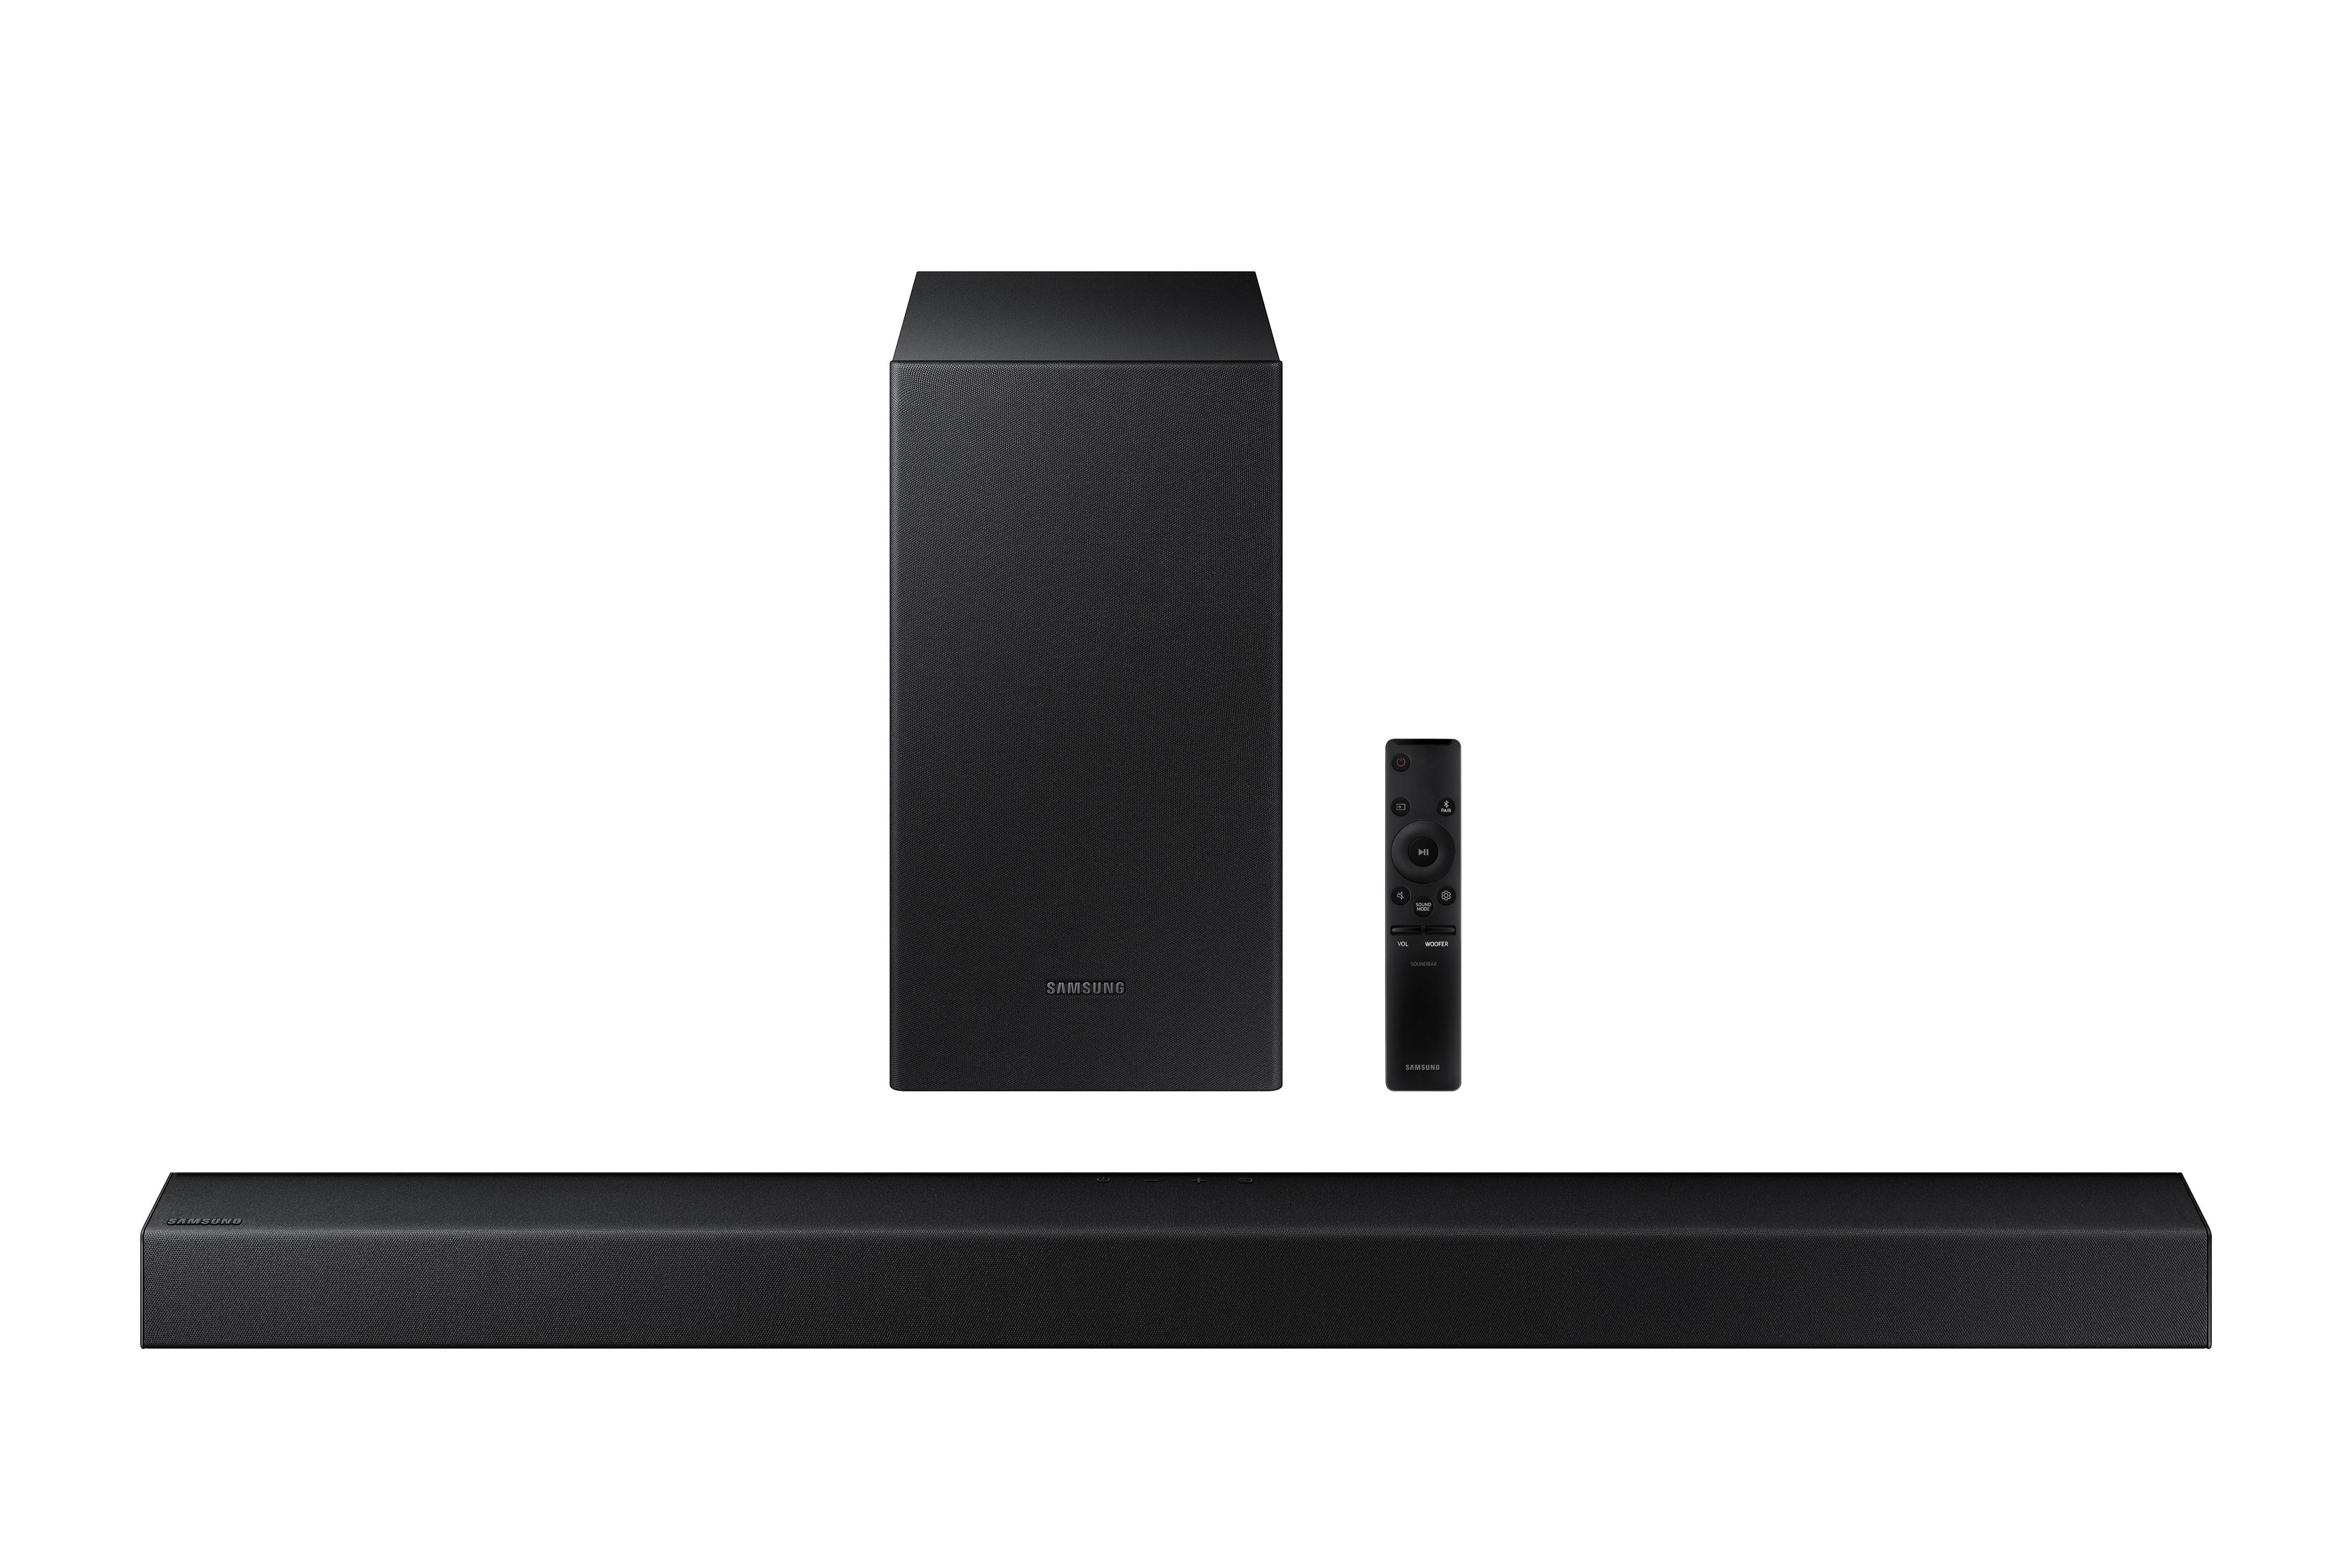 Black Friday Soundbar Deal Boost Your Tv With This Cheap Soundbar From Walmart Trendly News Listennow Everyday 100shortnews Toptrendings Popularnews Reviews Trendlynews